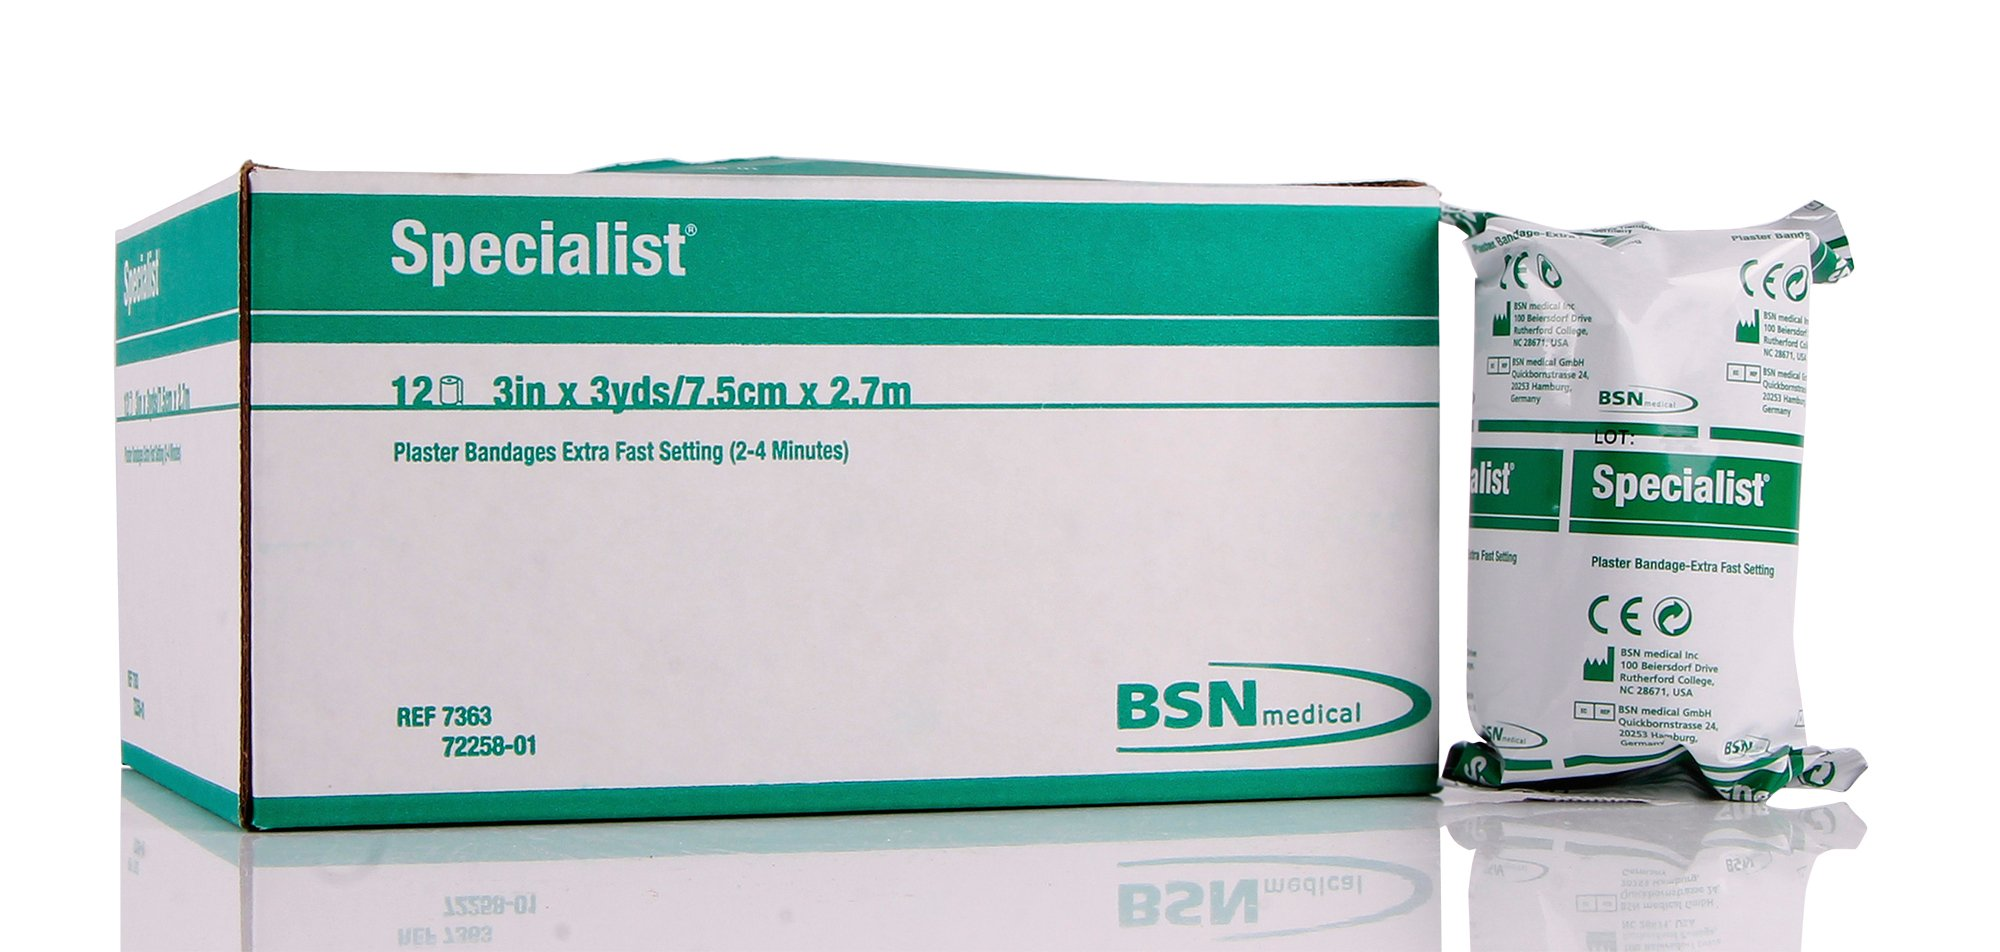 7363 Bandage Cast Specialist Plaster 3''x3yds 2-4 Min X-Fast 12/Box Part# 7363...